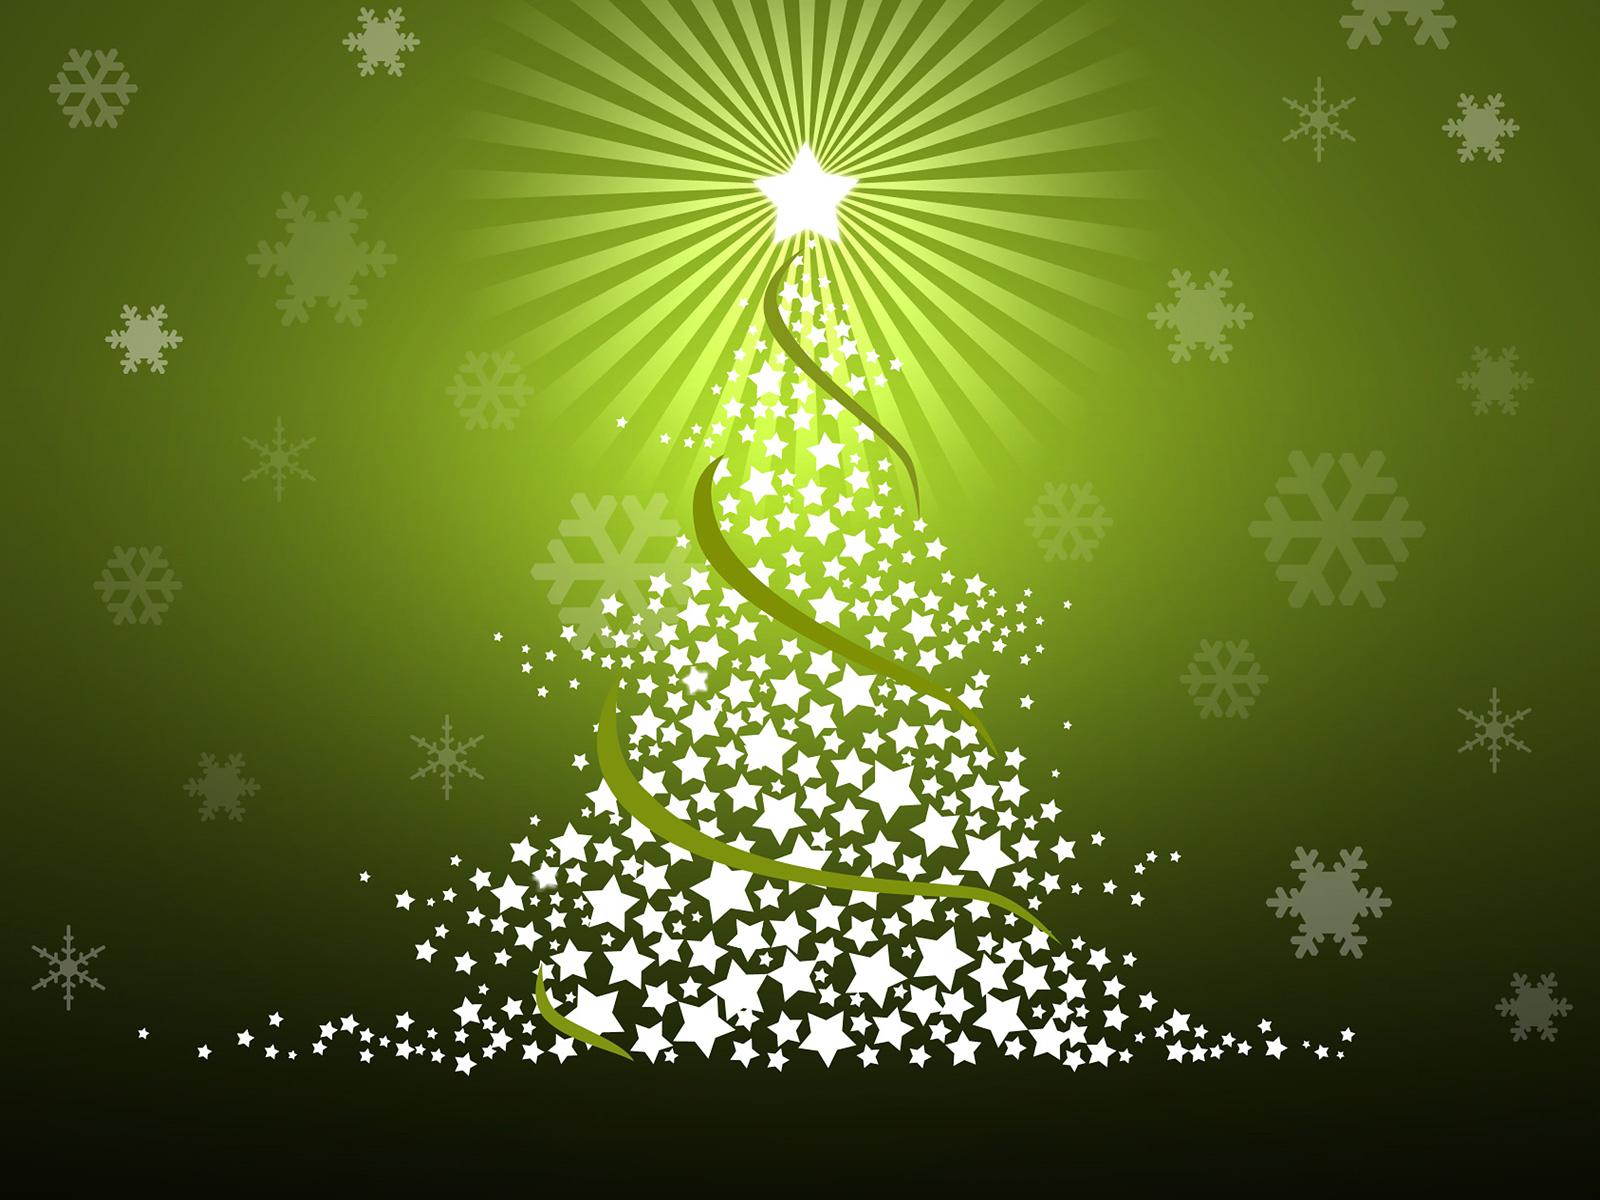 christmas tree desktop background   Desktop Wallpaper 1600x1200